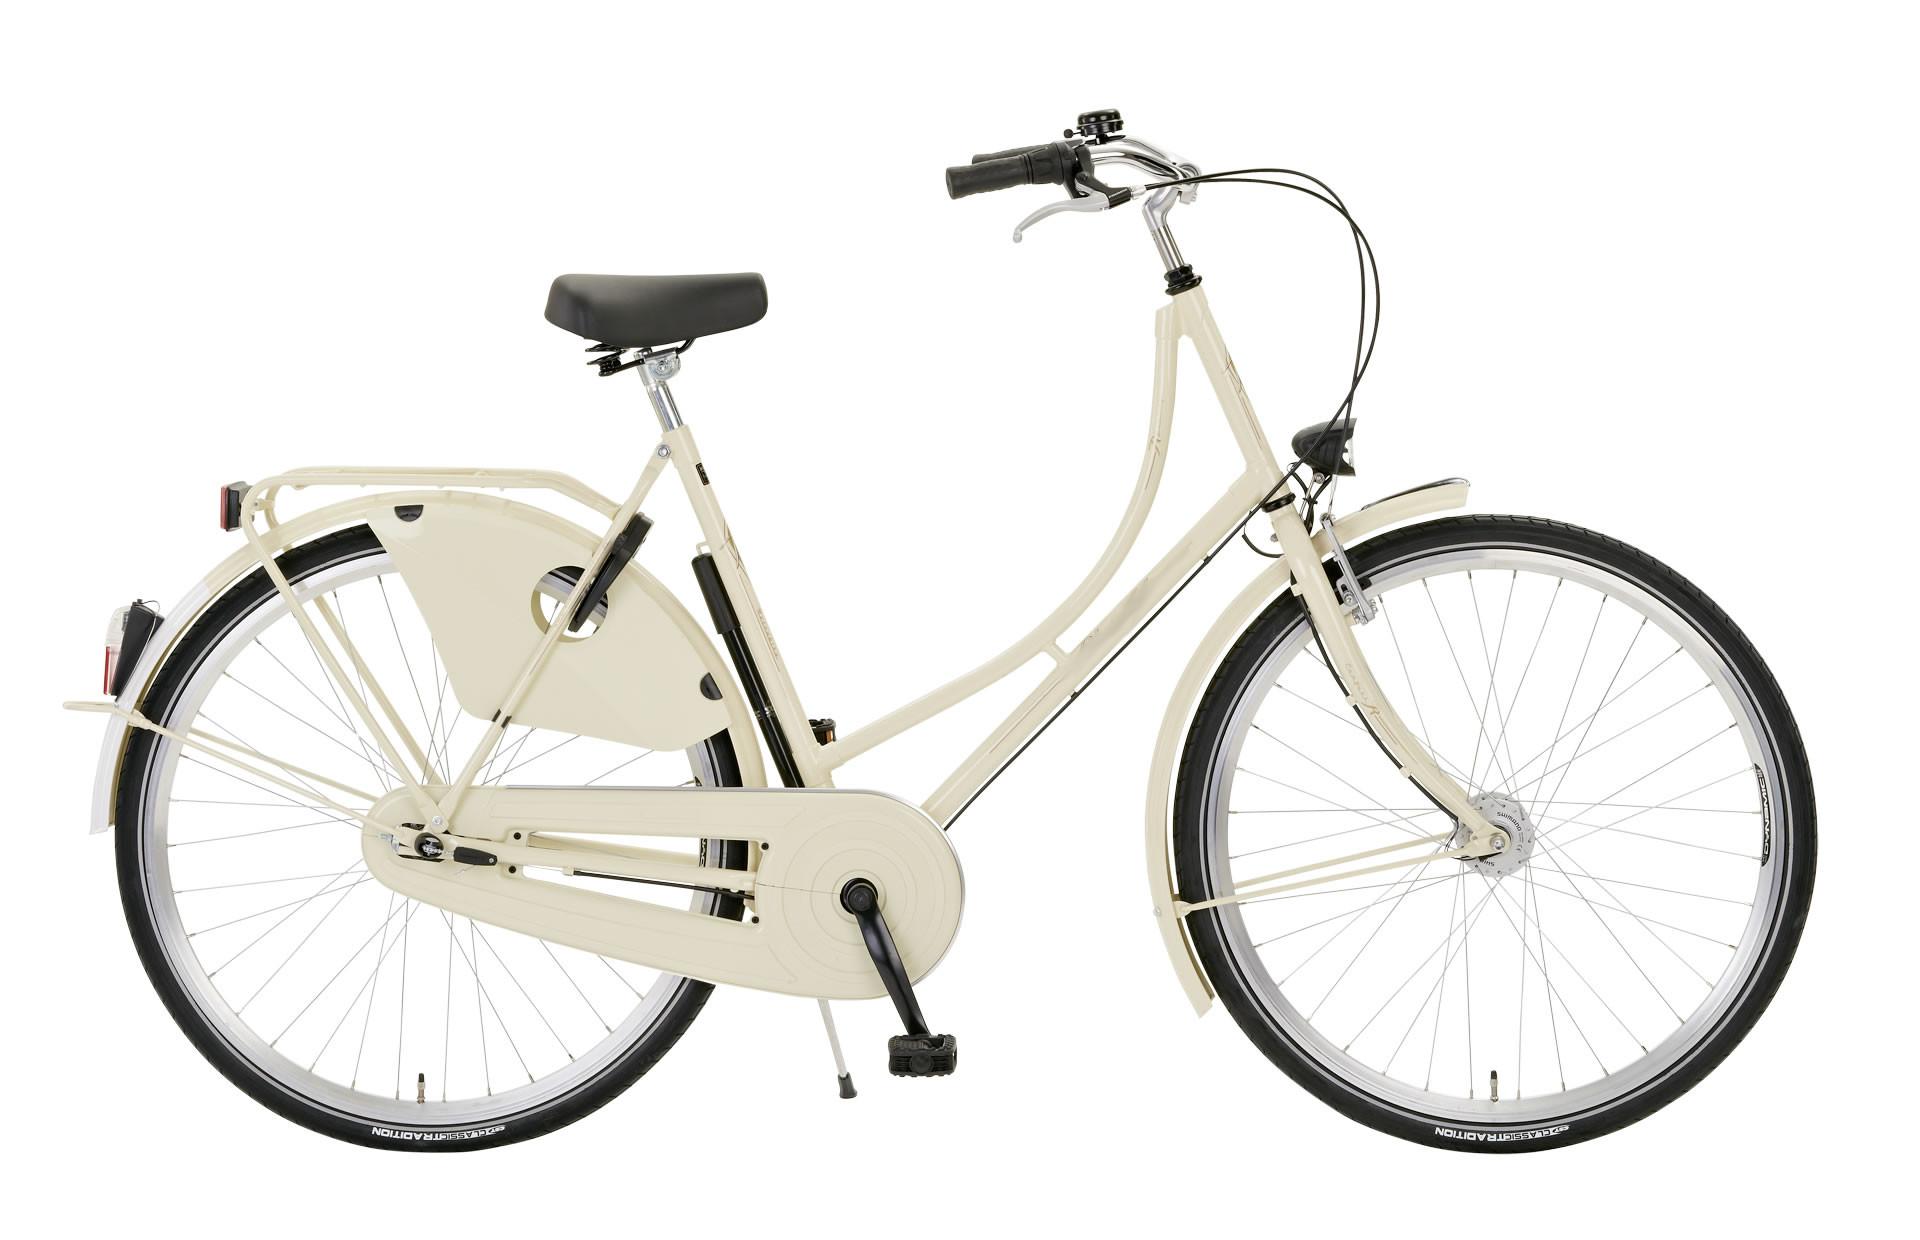 hollandrad 7 gang amsterdam beim spezialisten greenbike. Black Bedroom Furniture Sets. Home Design Ideas